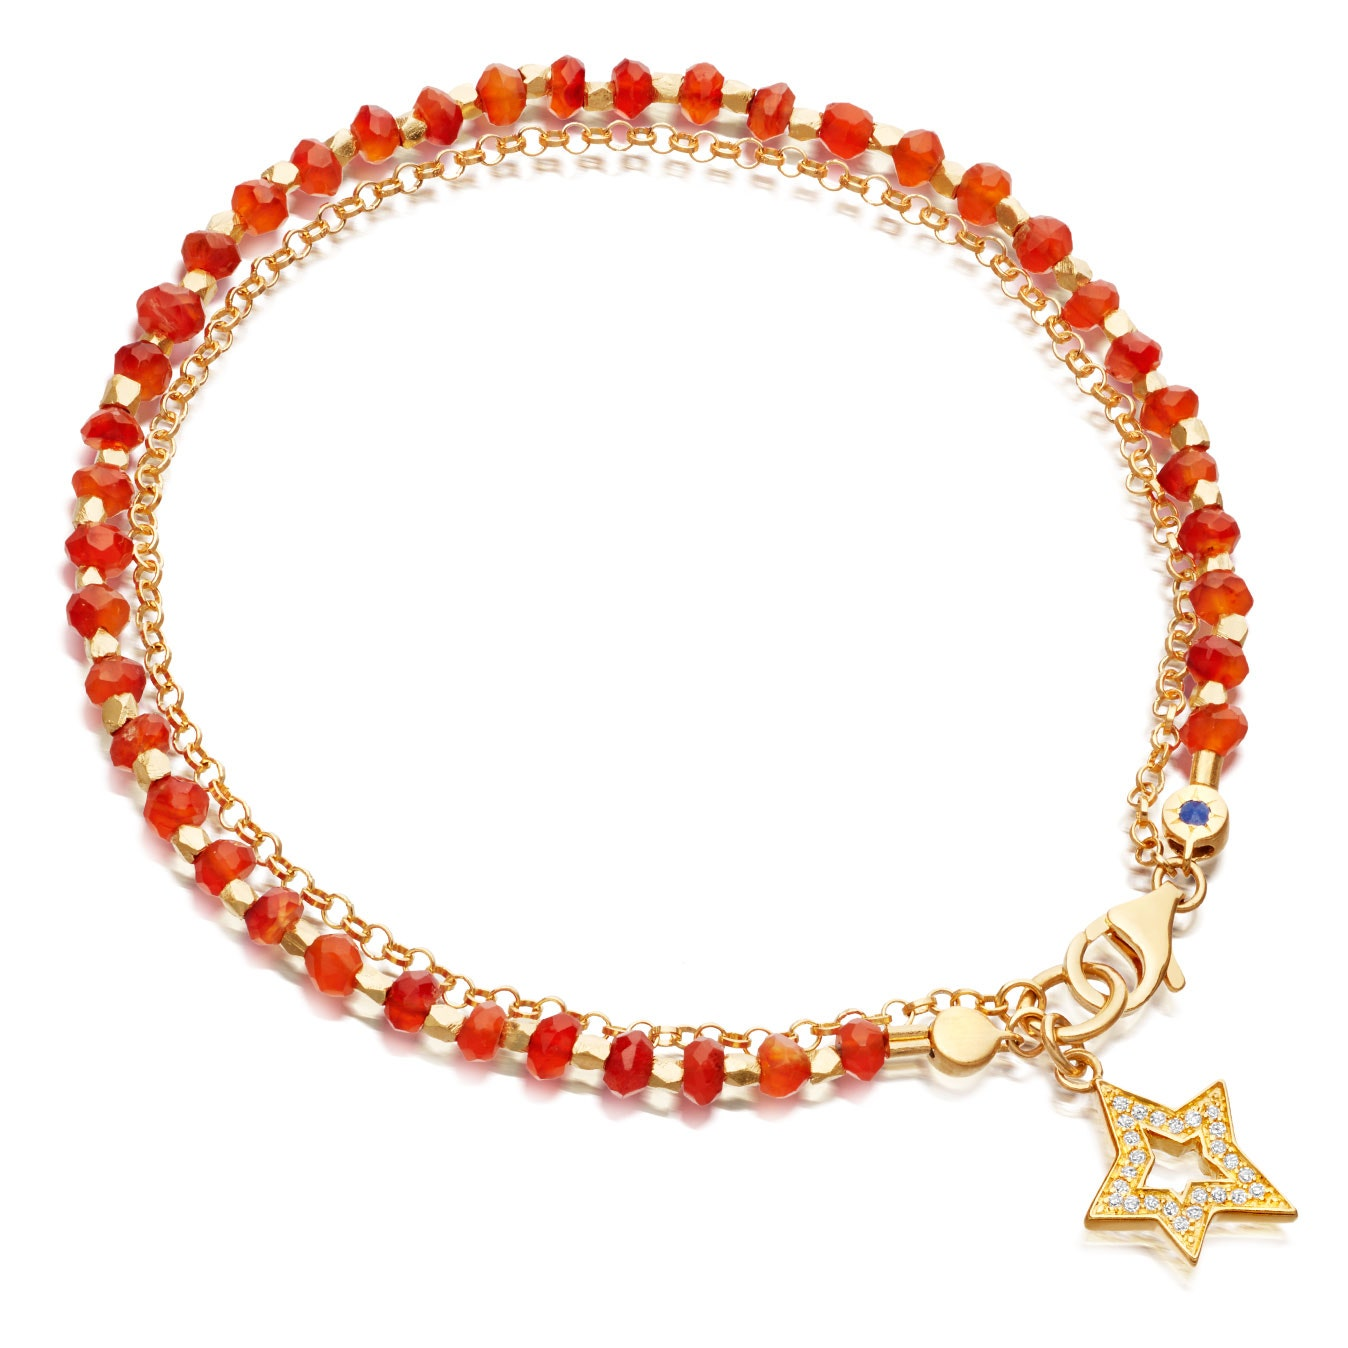 Carnelian Shooting Star Biography Bracelet